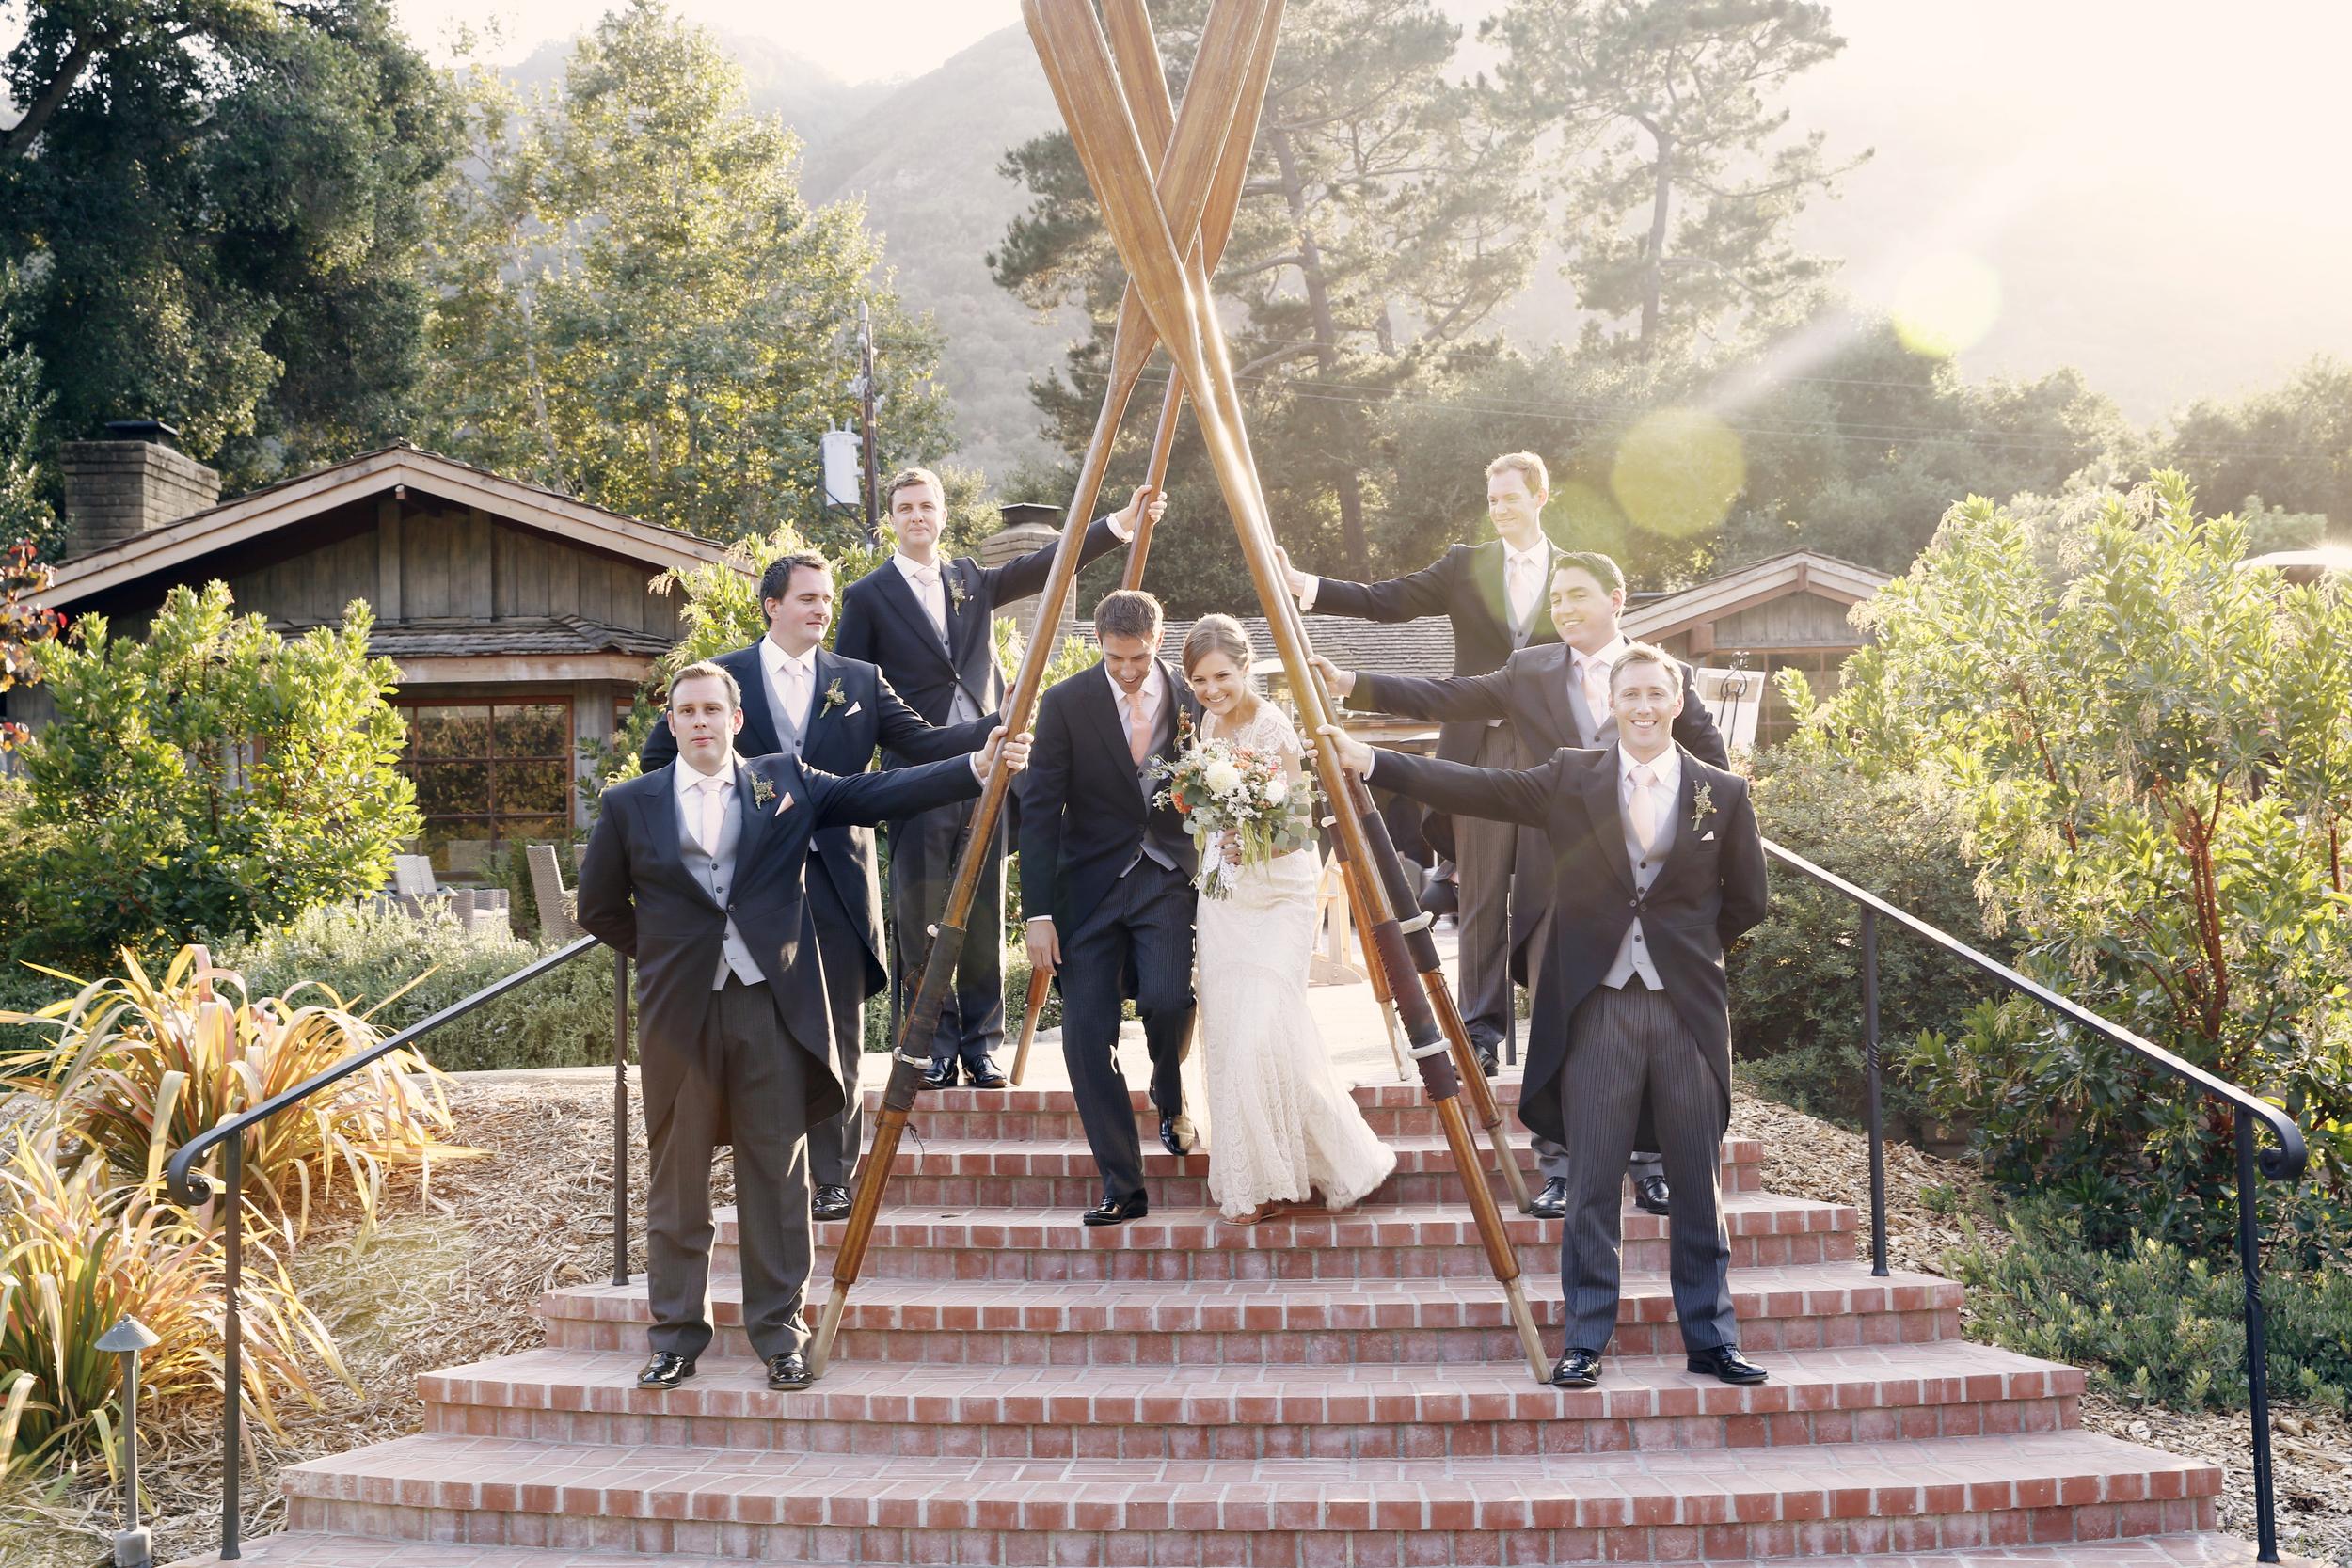 Carmel Wedding Photographers With Elegance and Style